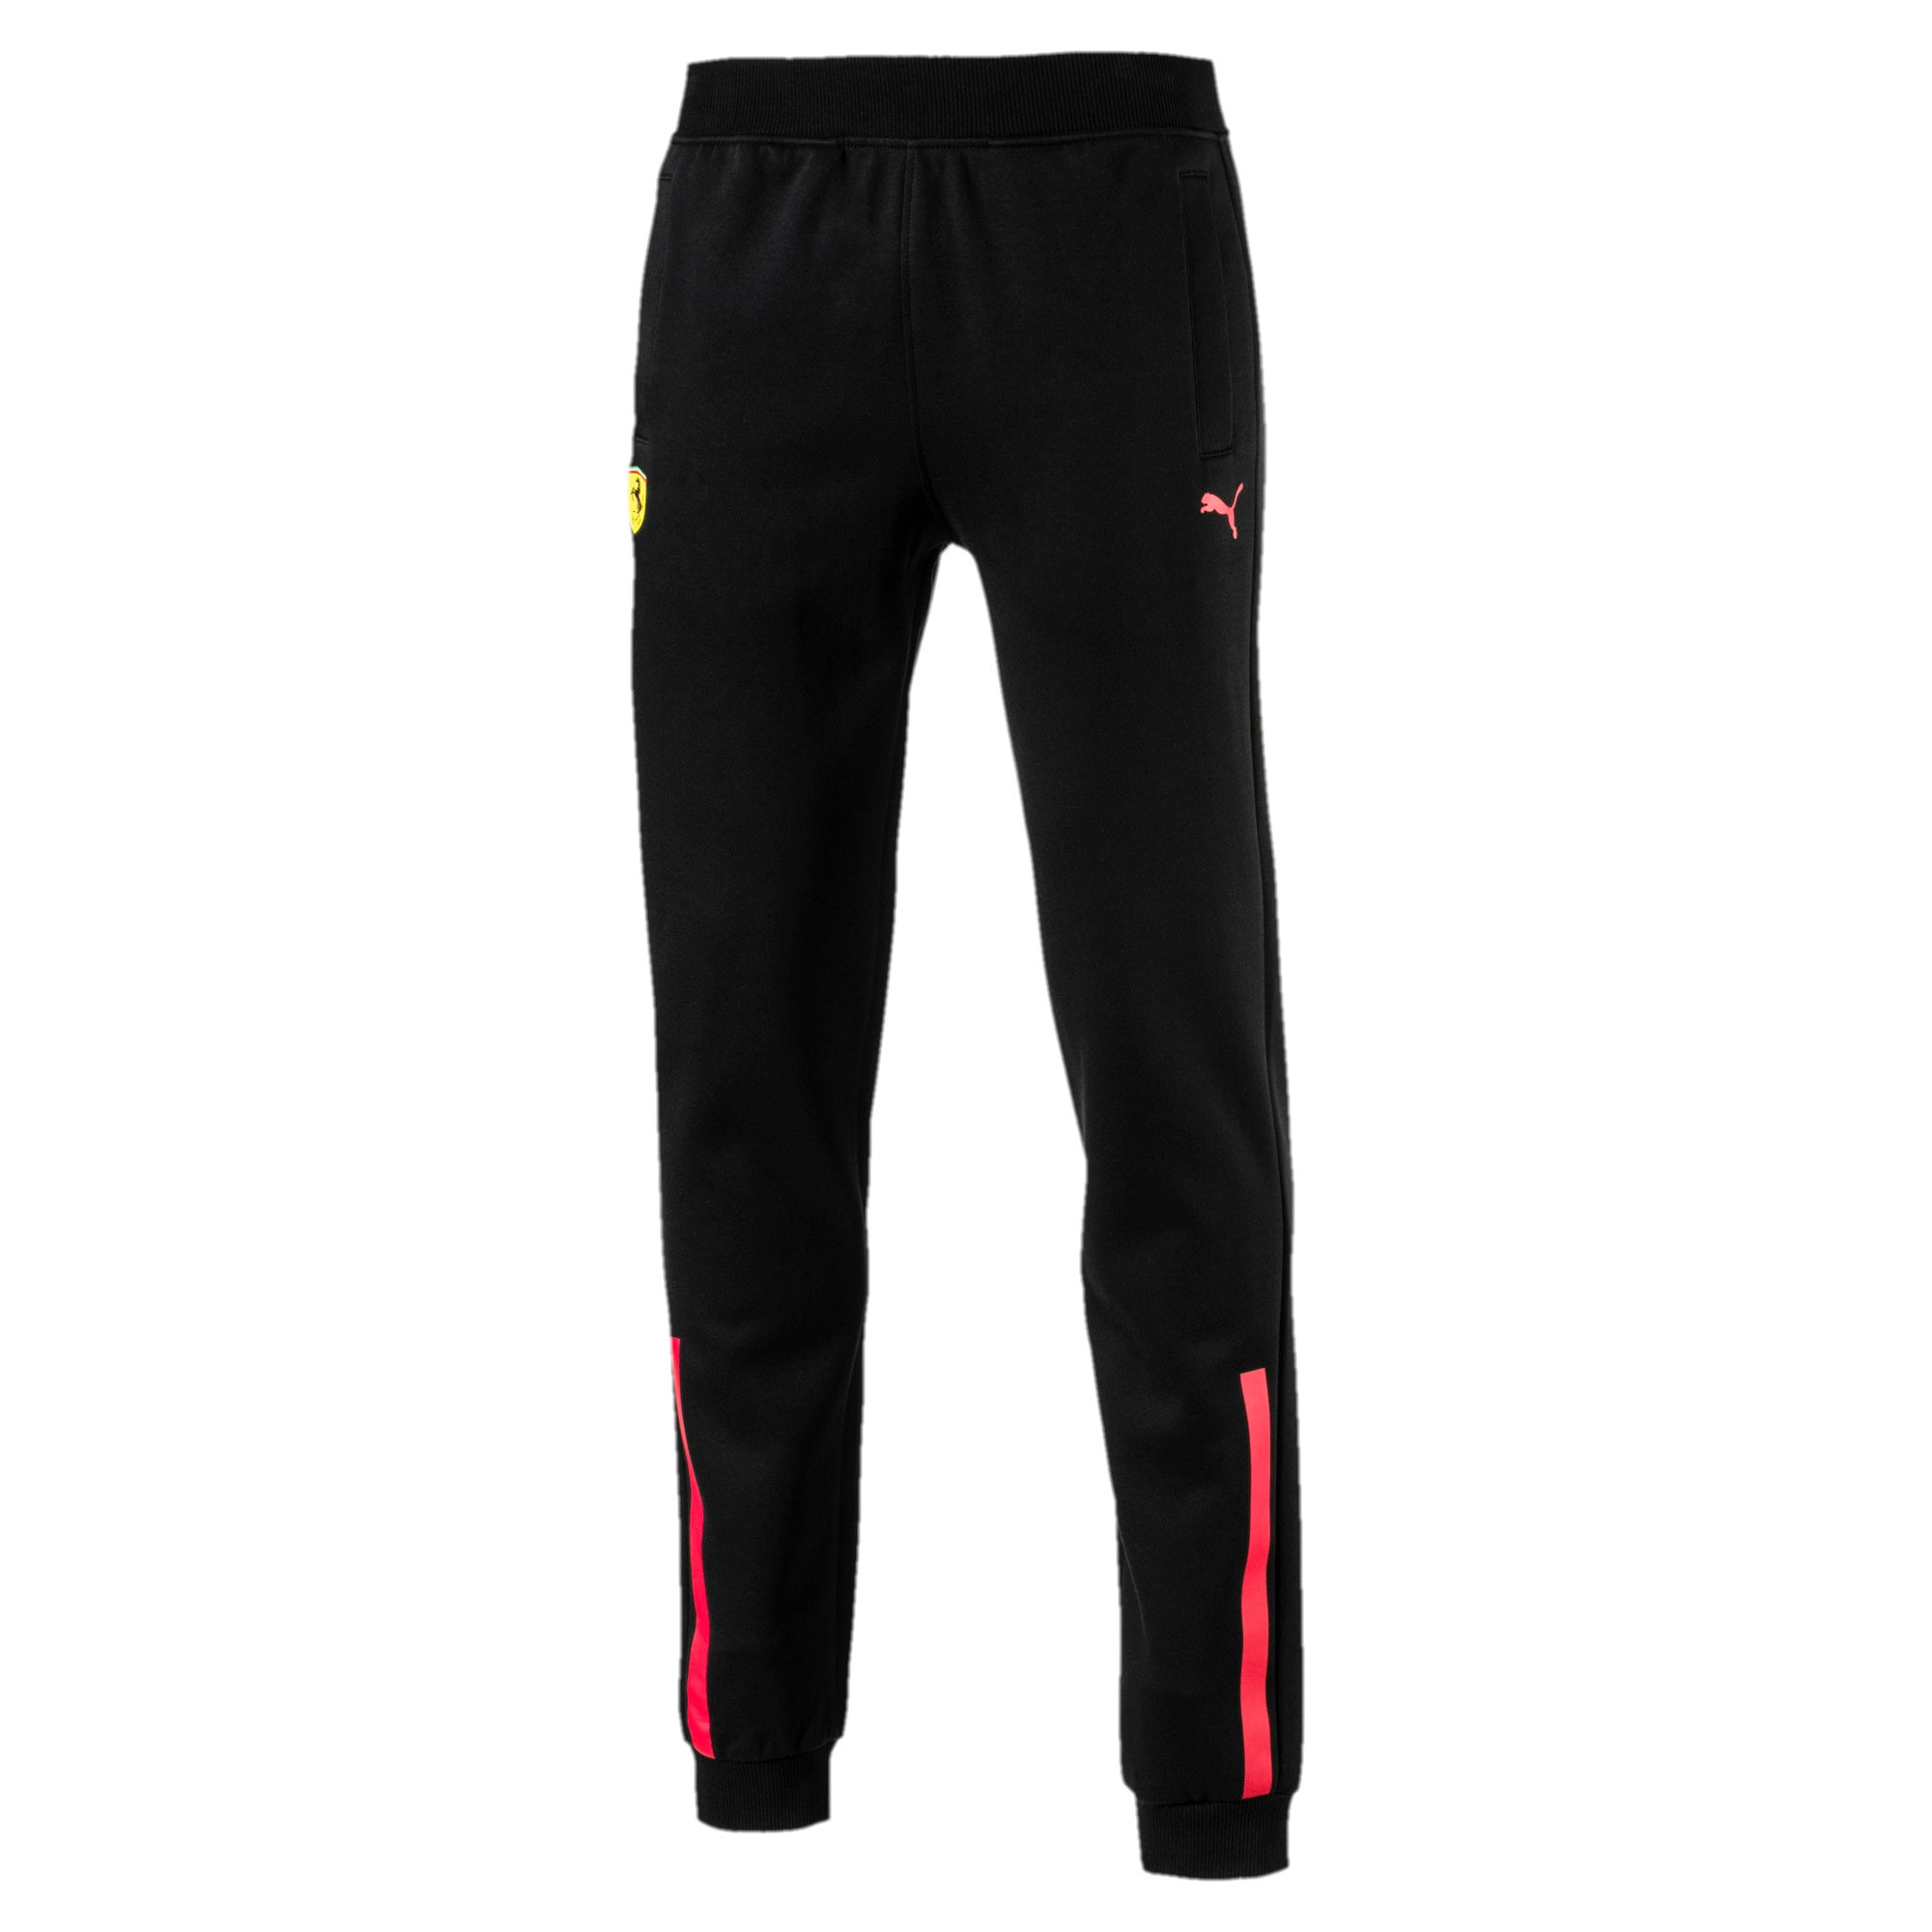 Thumbnail 1 of Ferrari Men's Sweatpants, Puma Black, medium